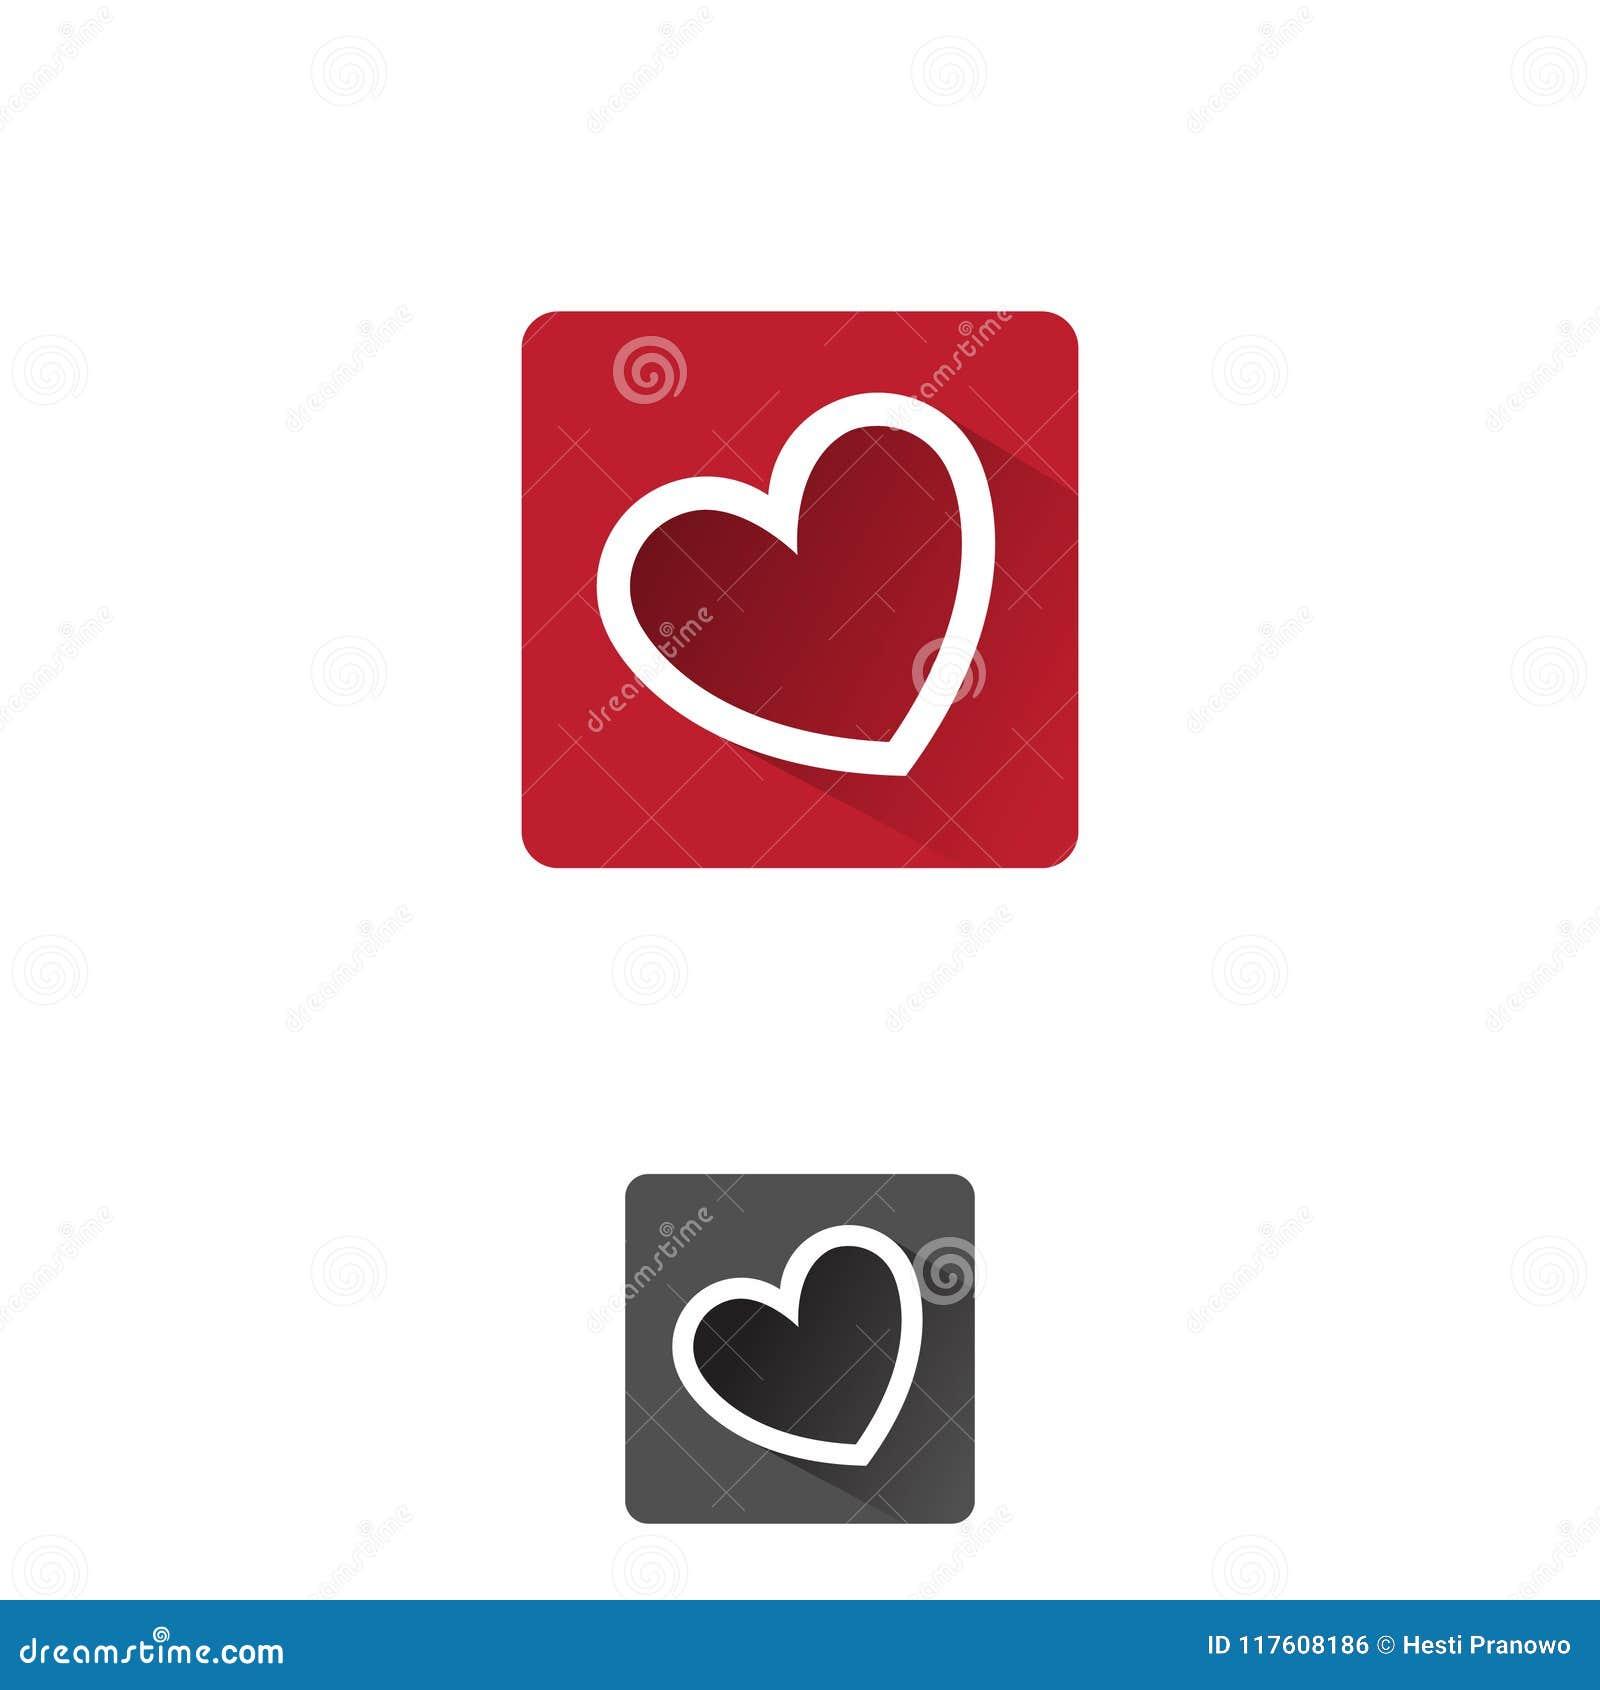 Heart App Symbol Of Love And Romantic Feelings Set Concept Design